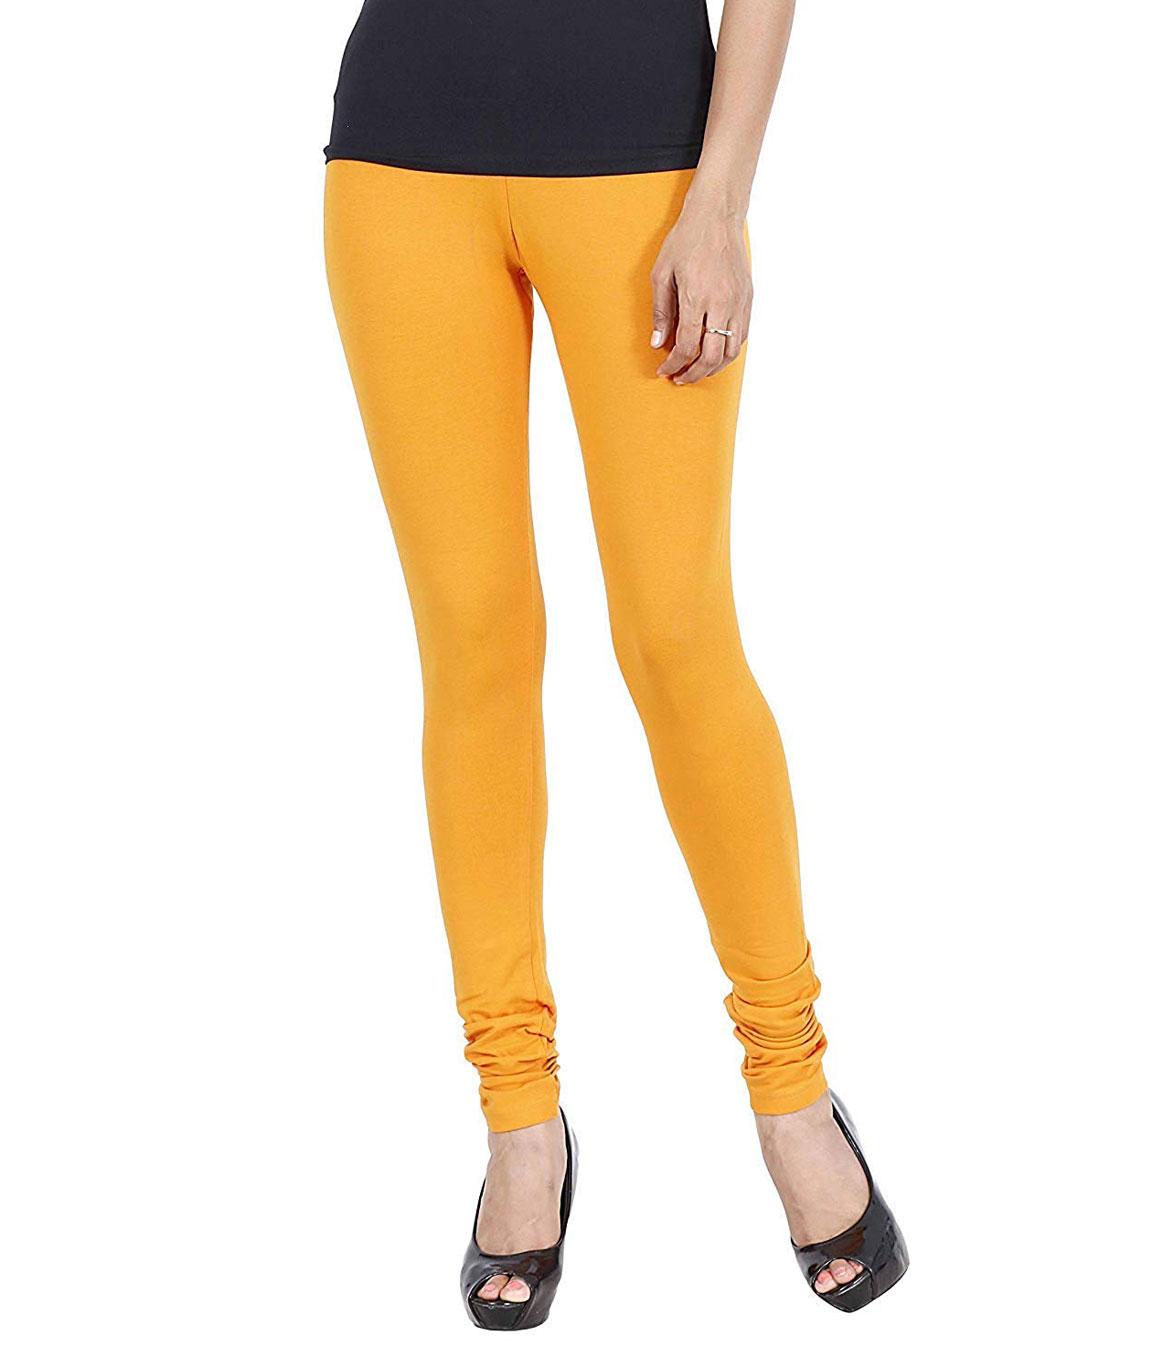 Swag  Cotton Leggings Churidar, Comfortable, and Soft Leggings(Turmaric Yellow)